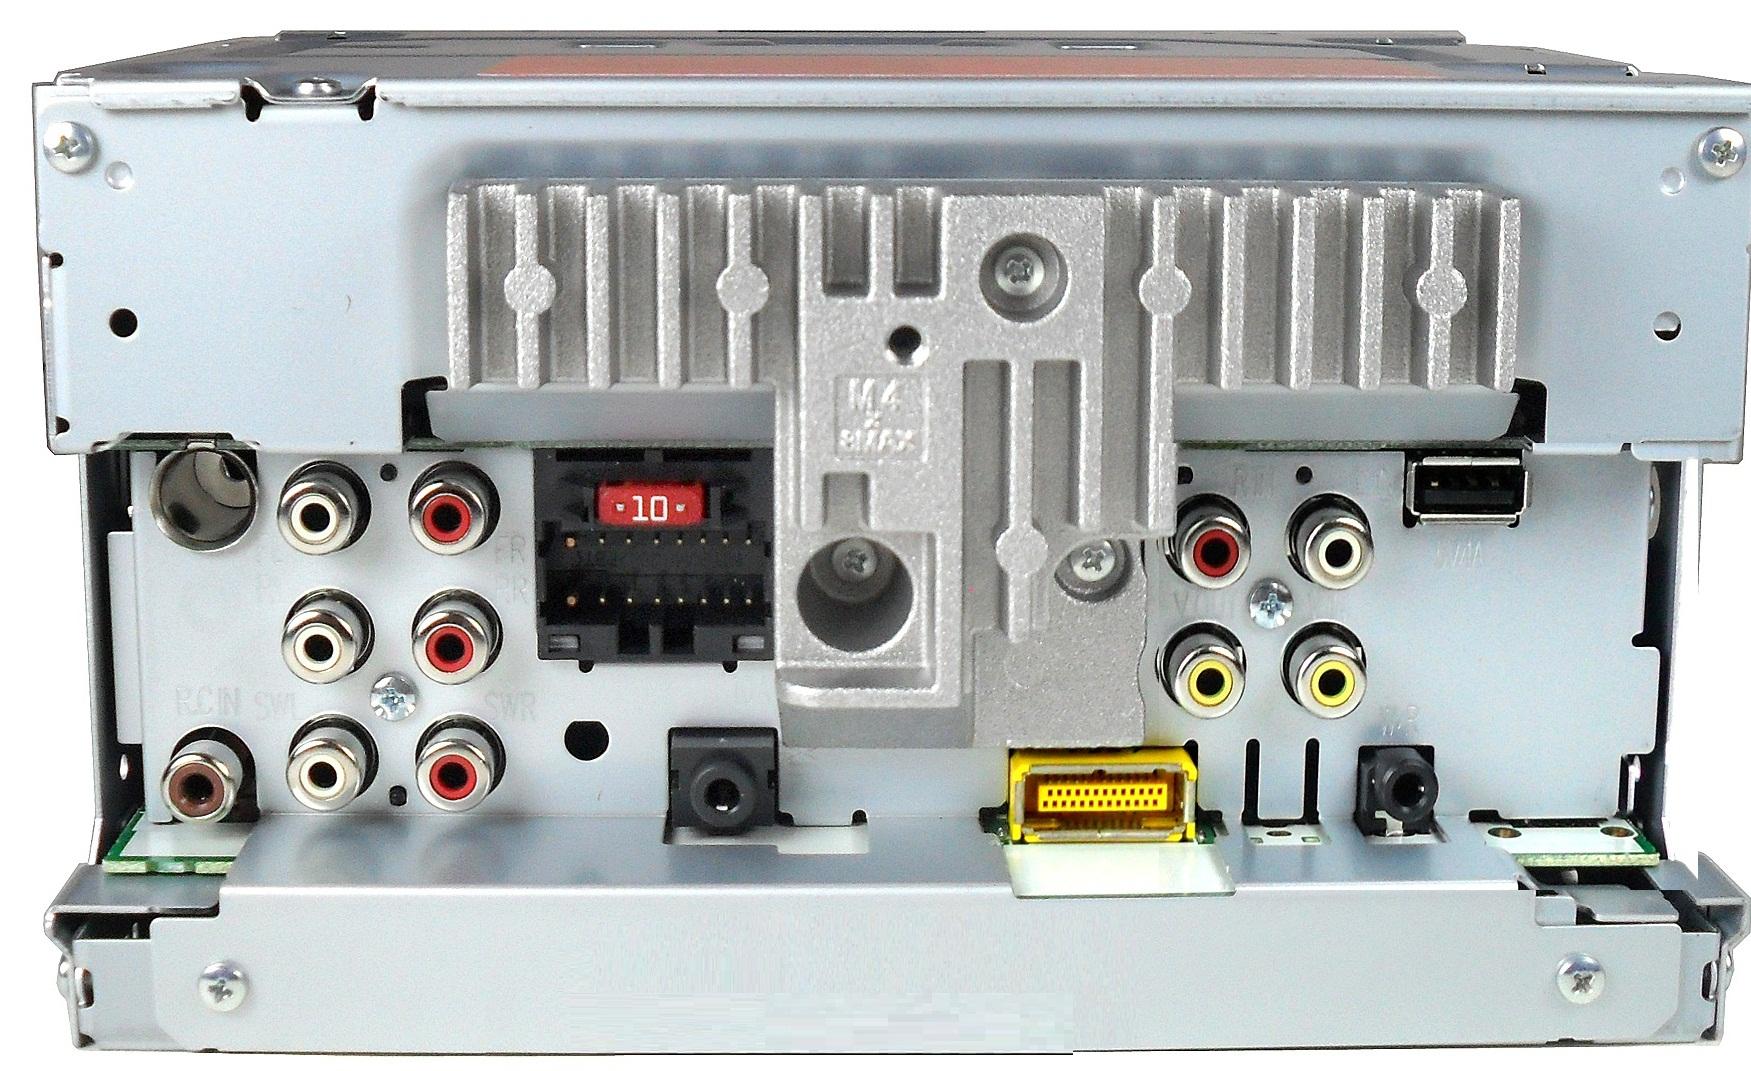 pioneer avh x1500dvd wiring diagram exit ramp traffic x1600dvd car stereo touch